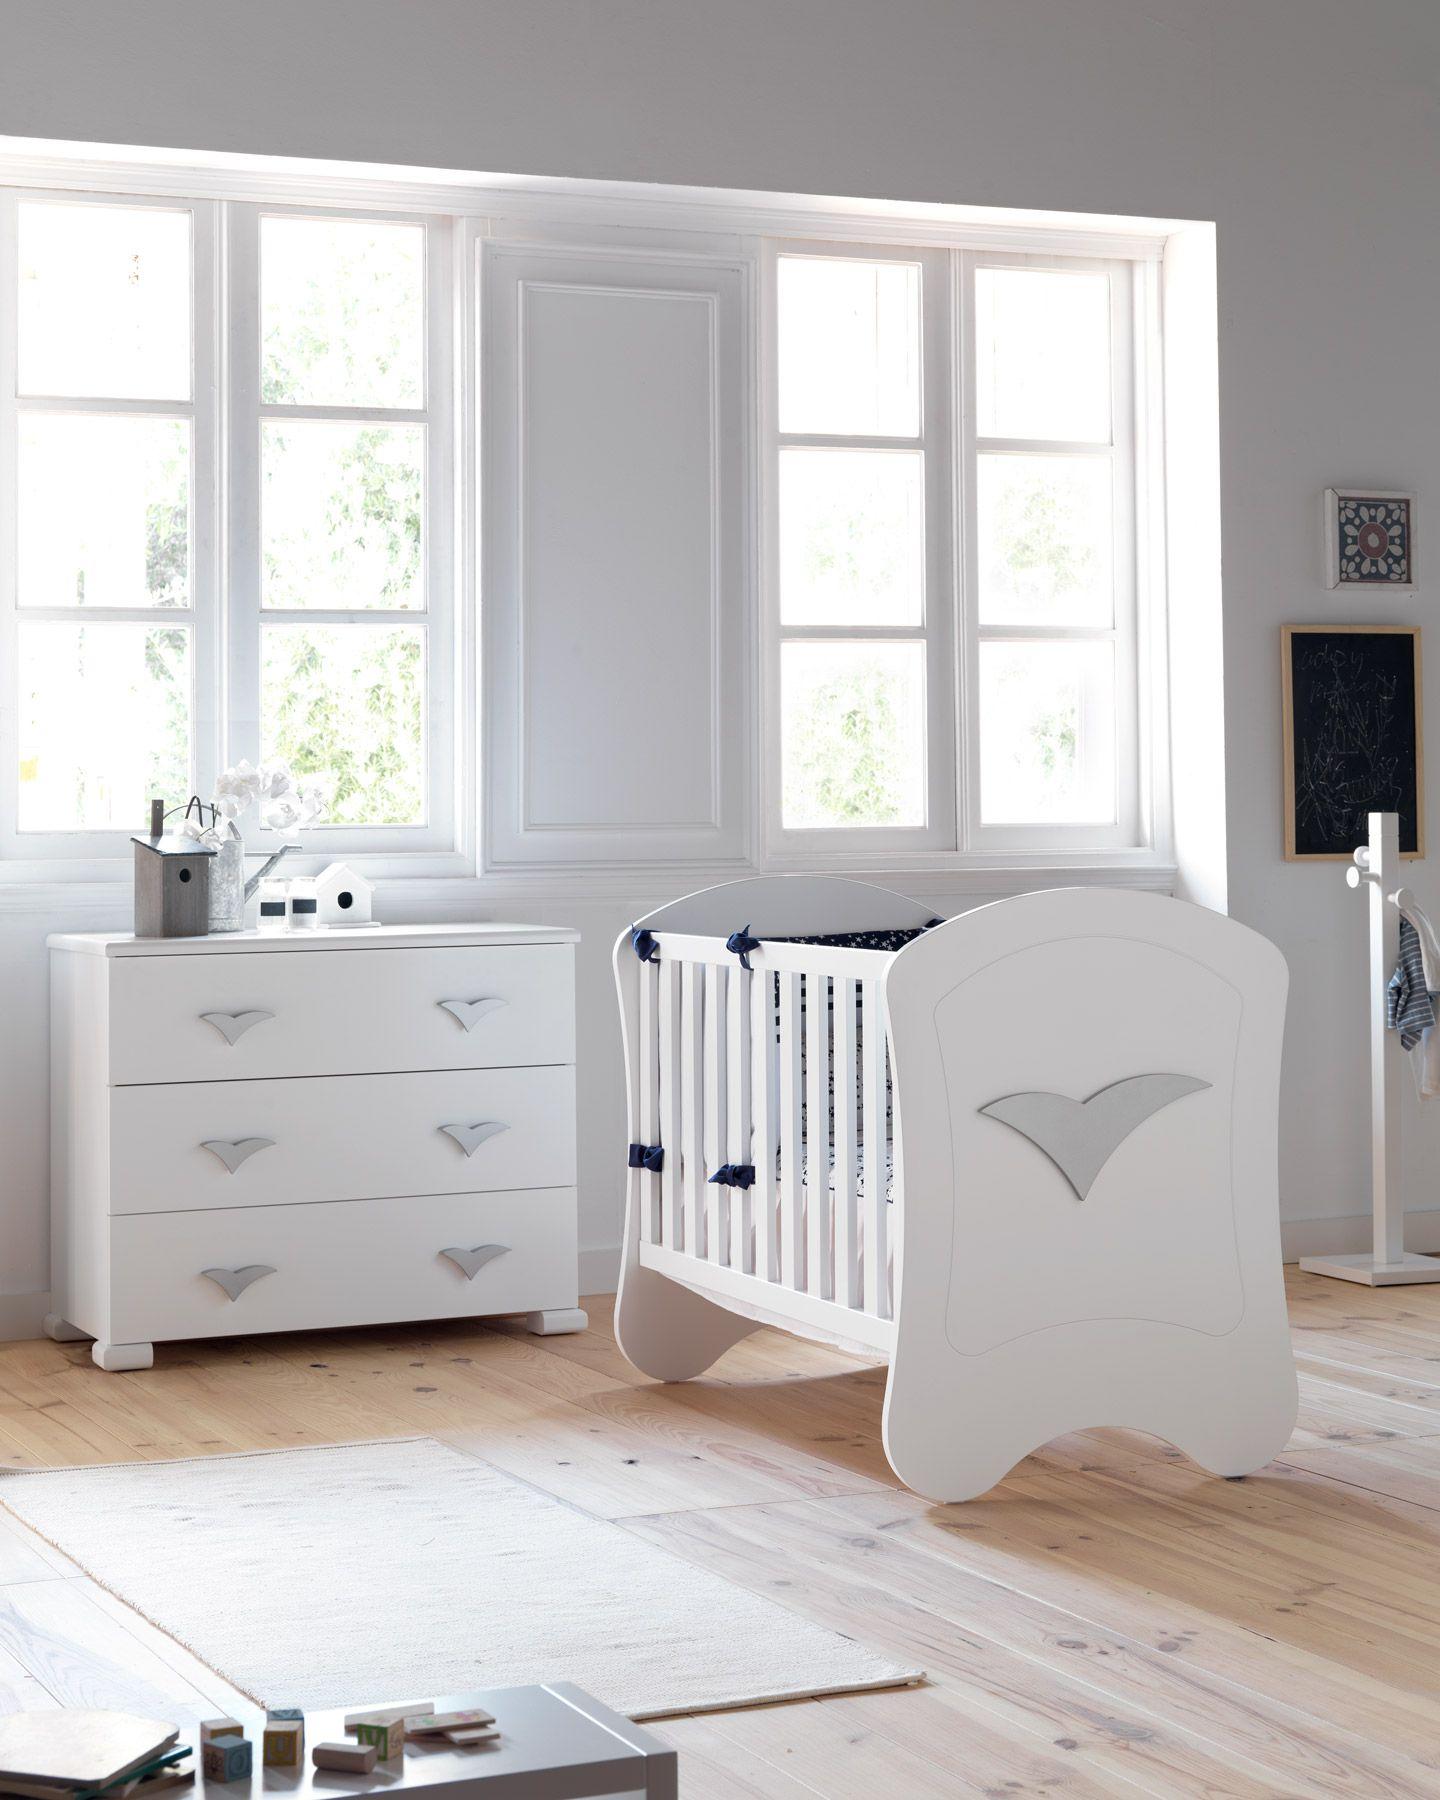 Ideas de cunas funcionales para tu bebé #madera #modernas ...